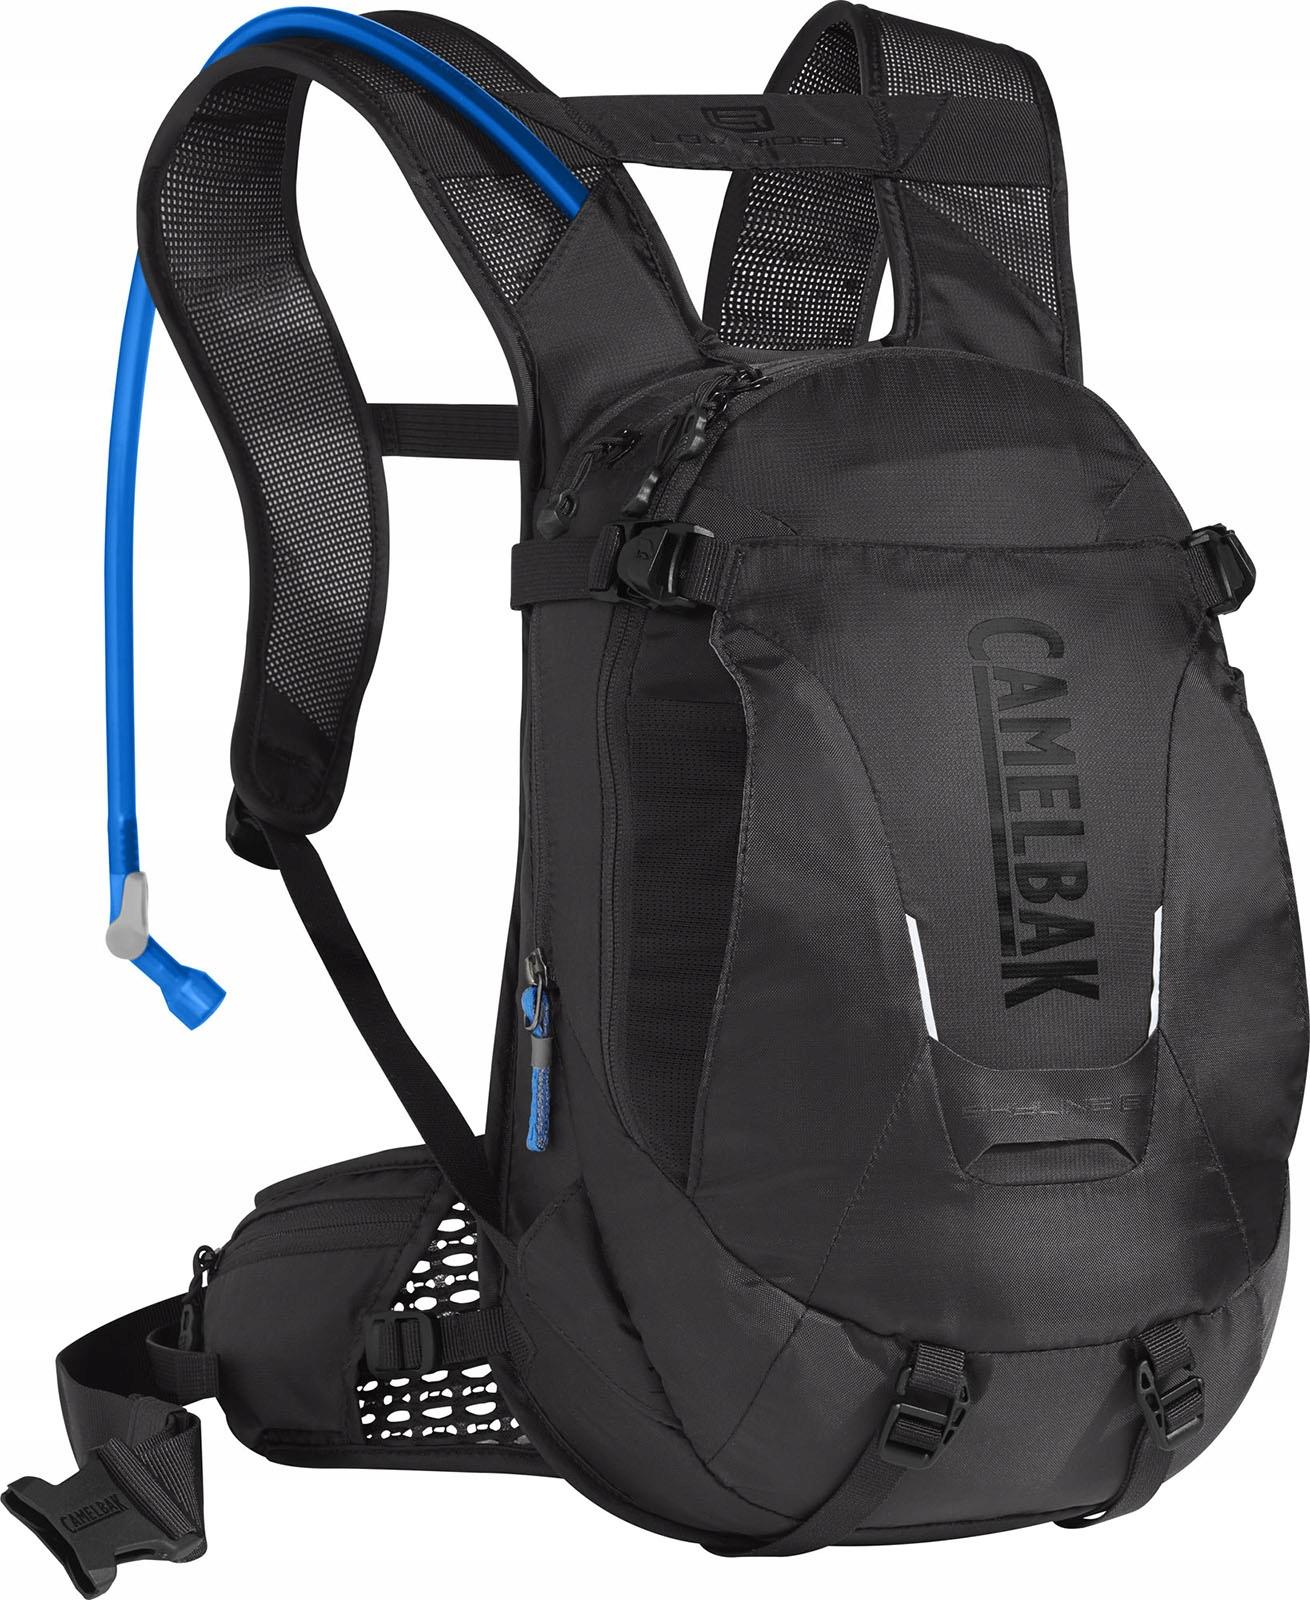 Plecak rowerowy CAMELBAK Skyline LR 10 # Black